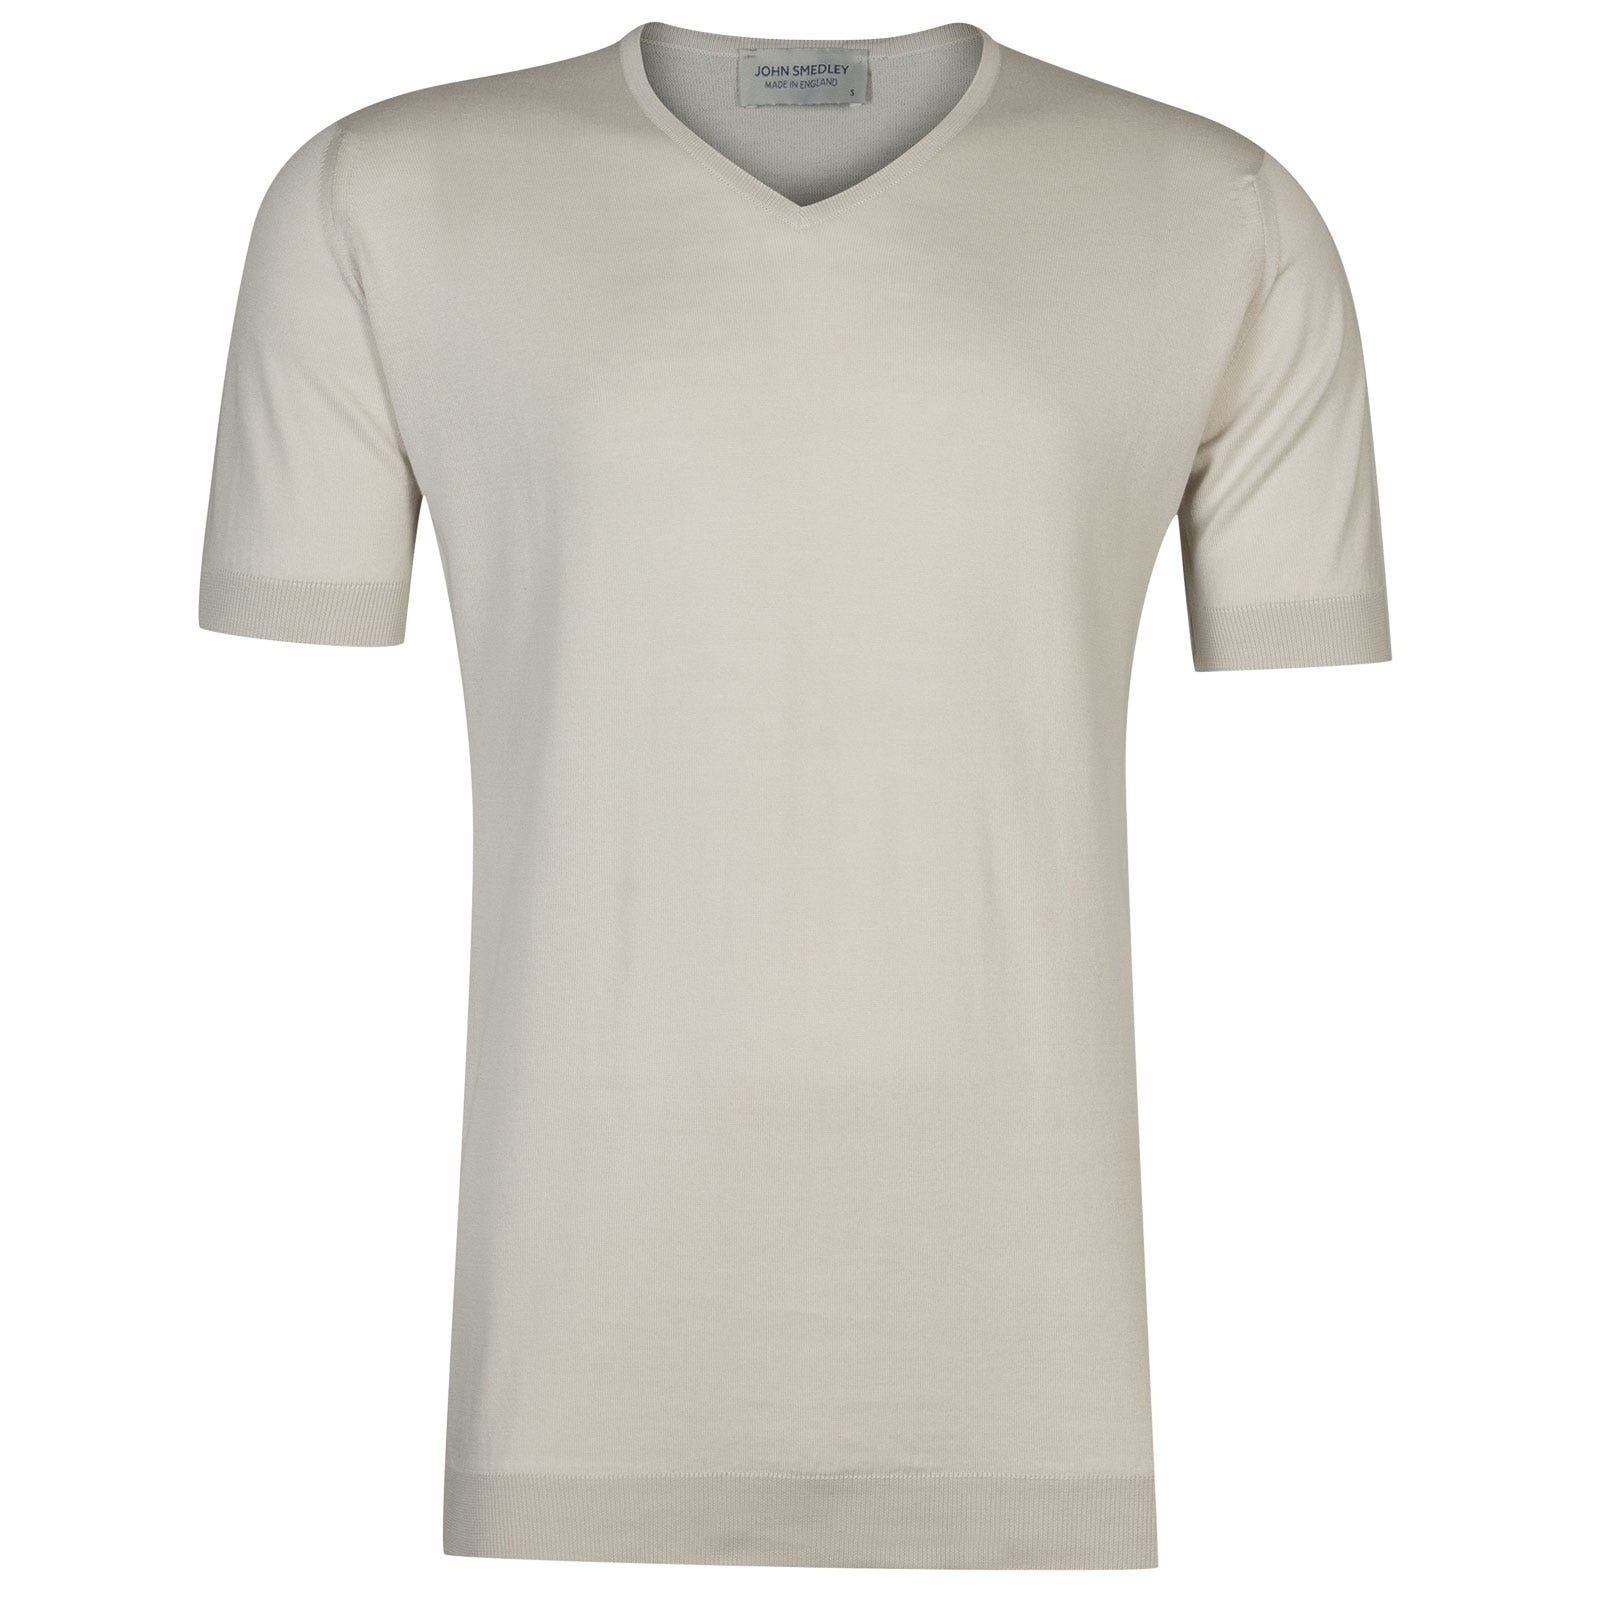 John Smedley Braedon in Brunel Beige T-Shirt-XXL